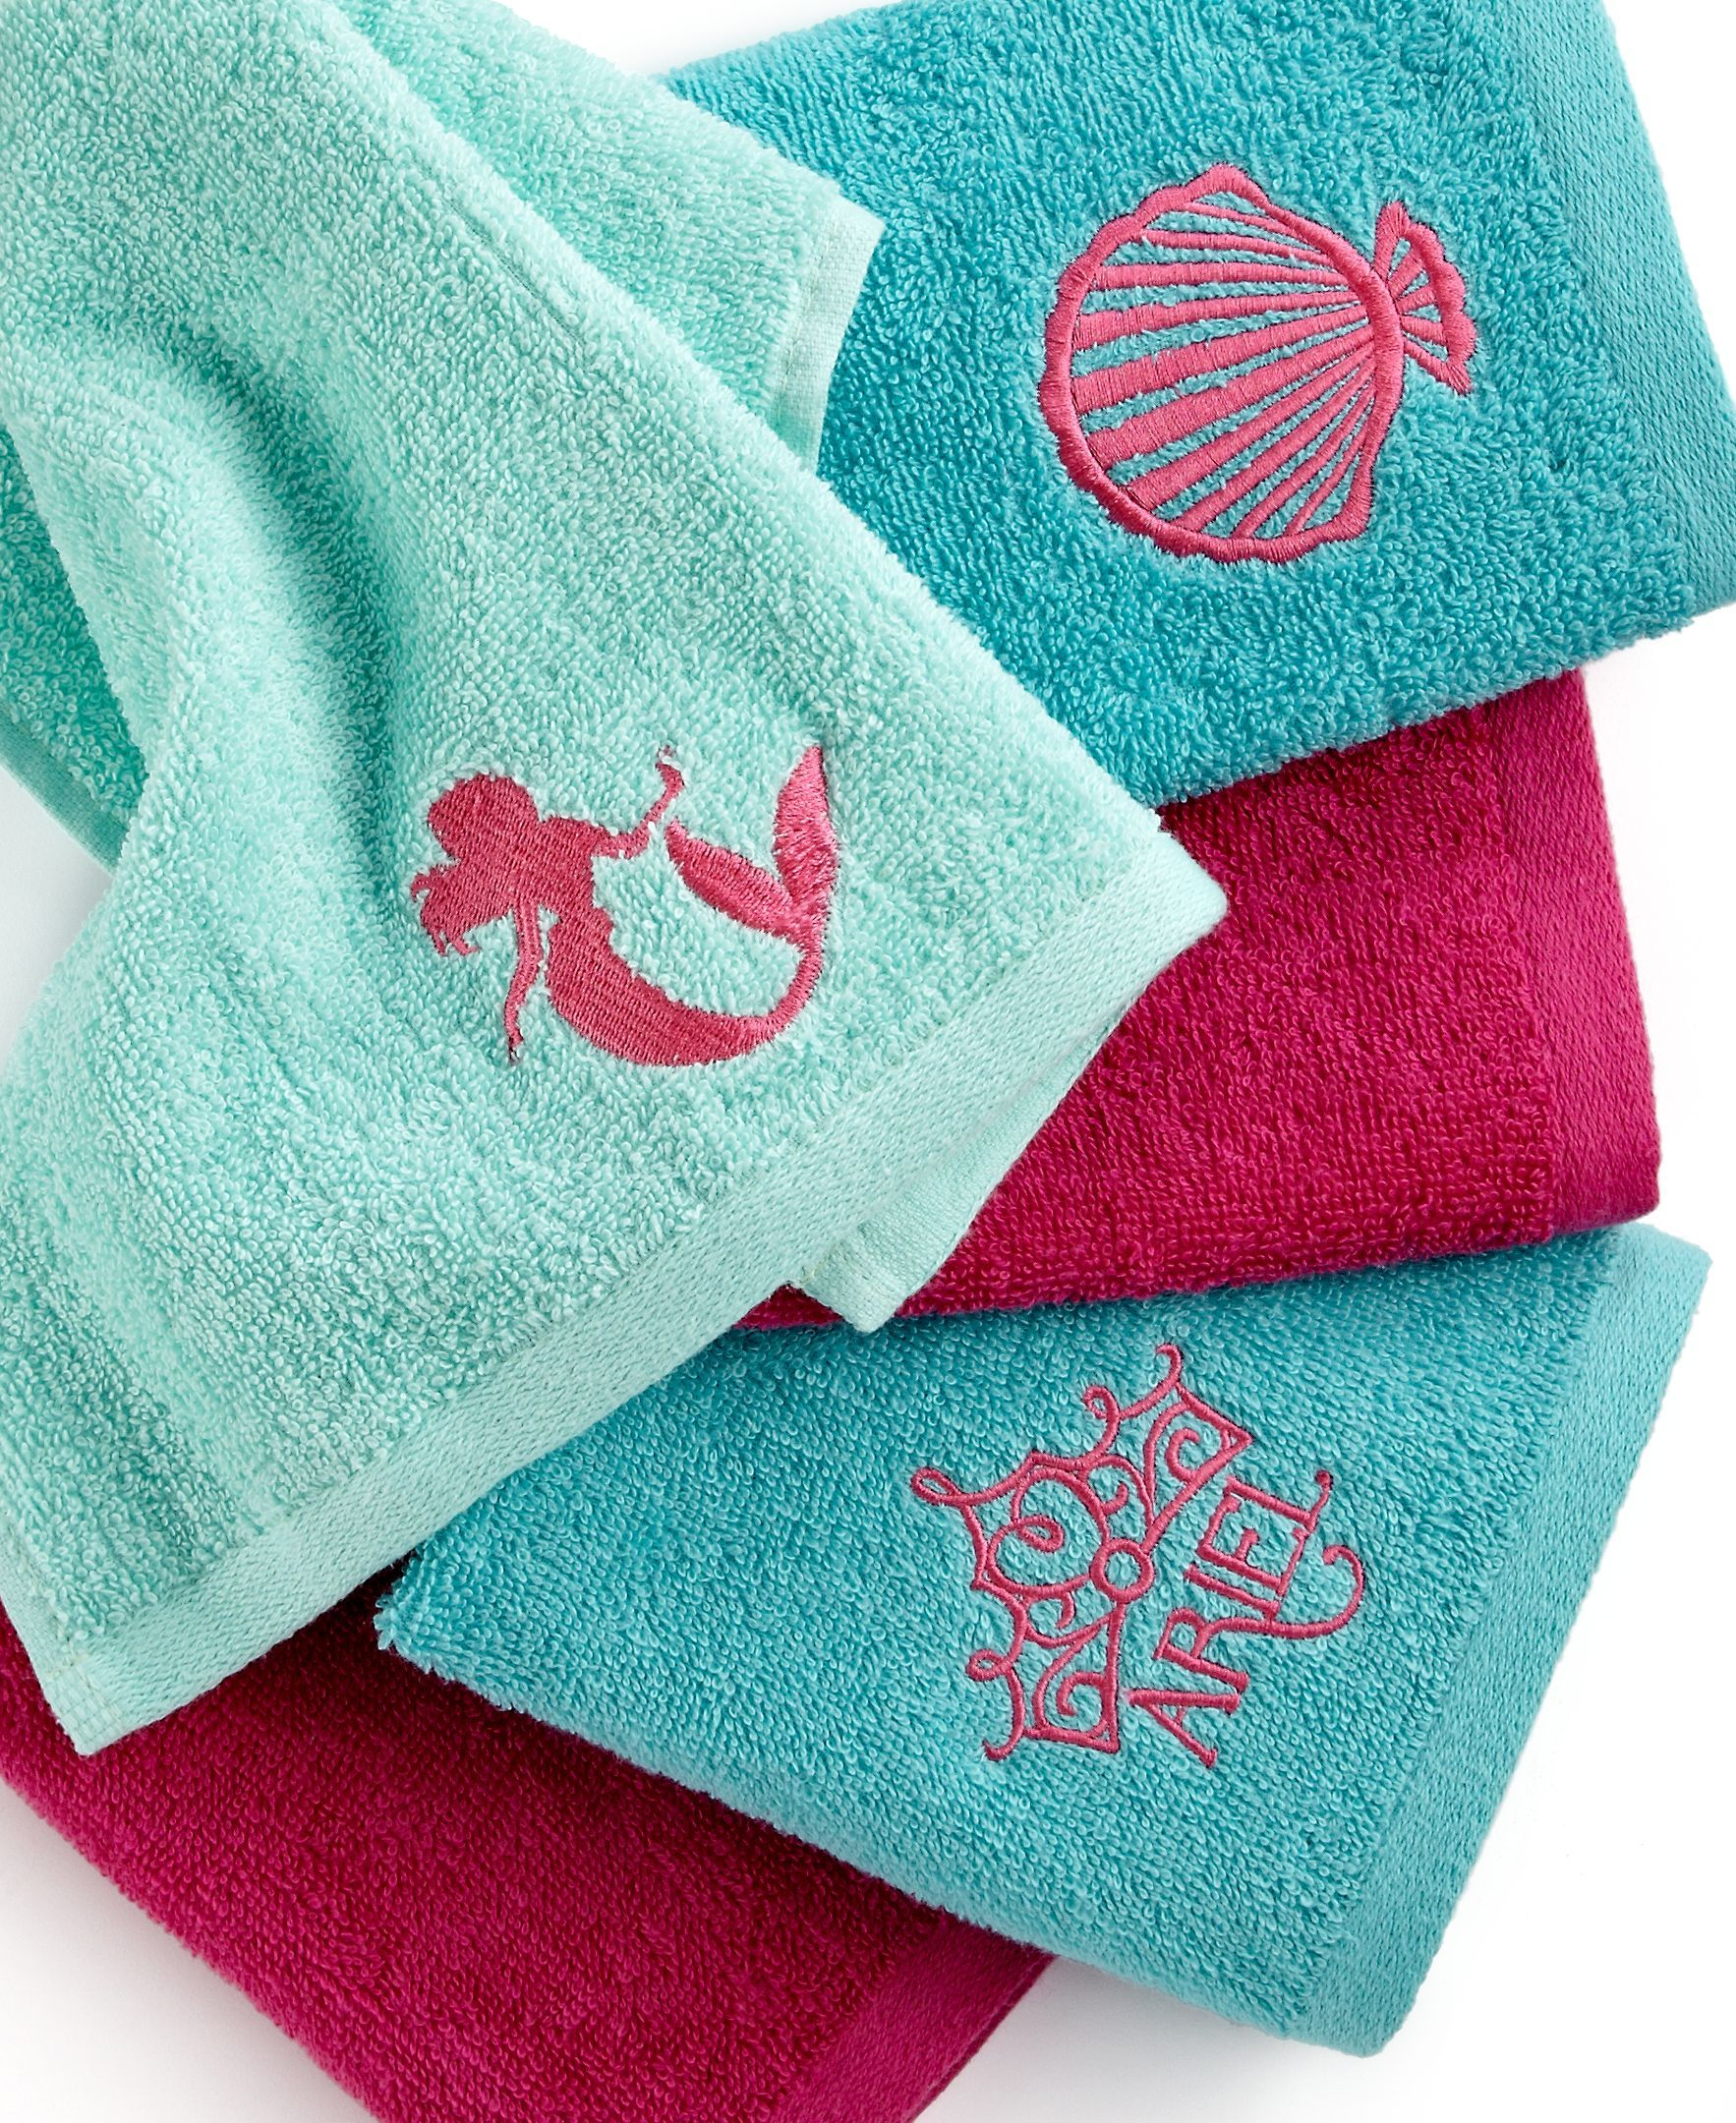 Disney Bath Accessories Little Mermaid Shimmer And Gleam